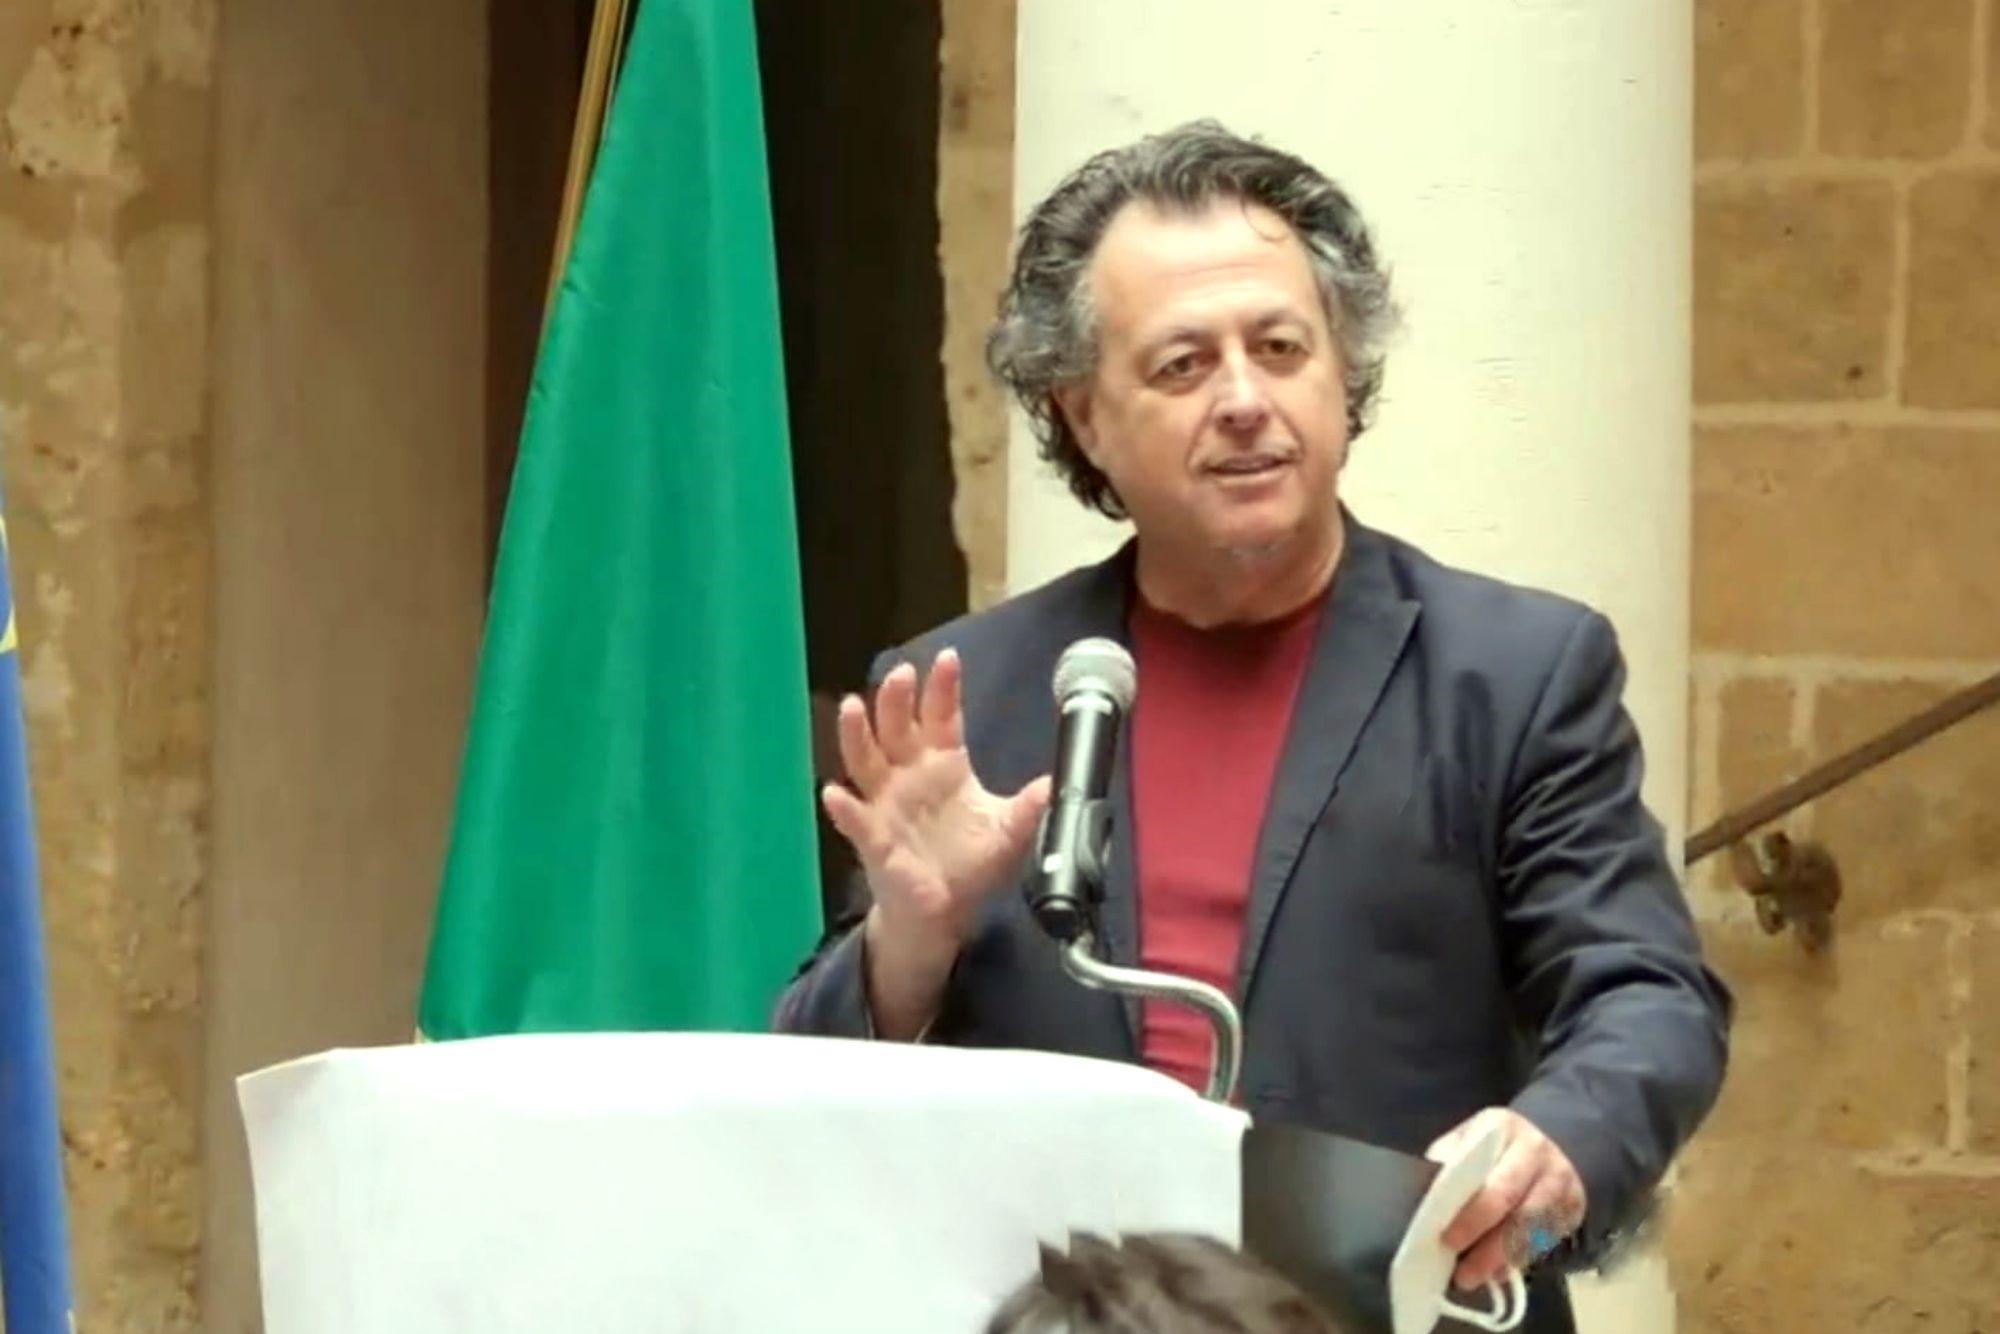 Antonio Macchia